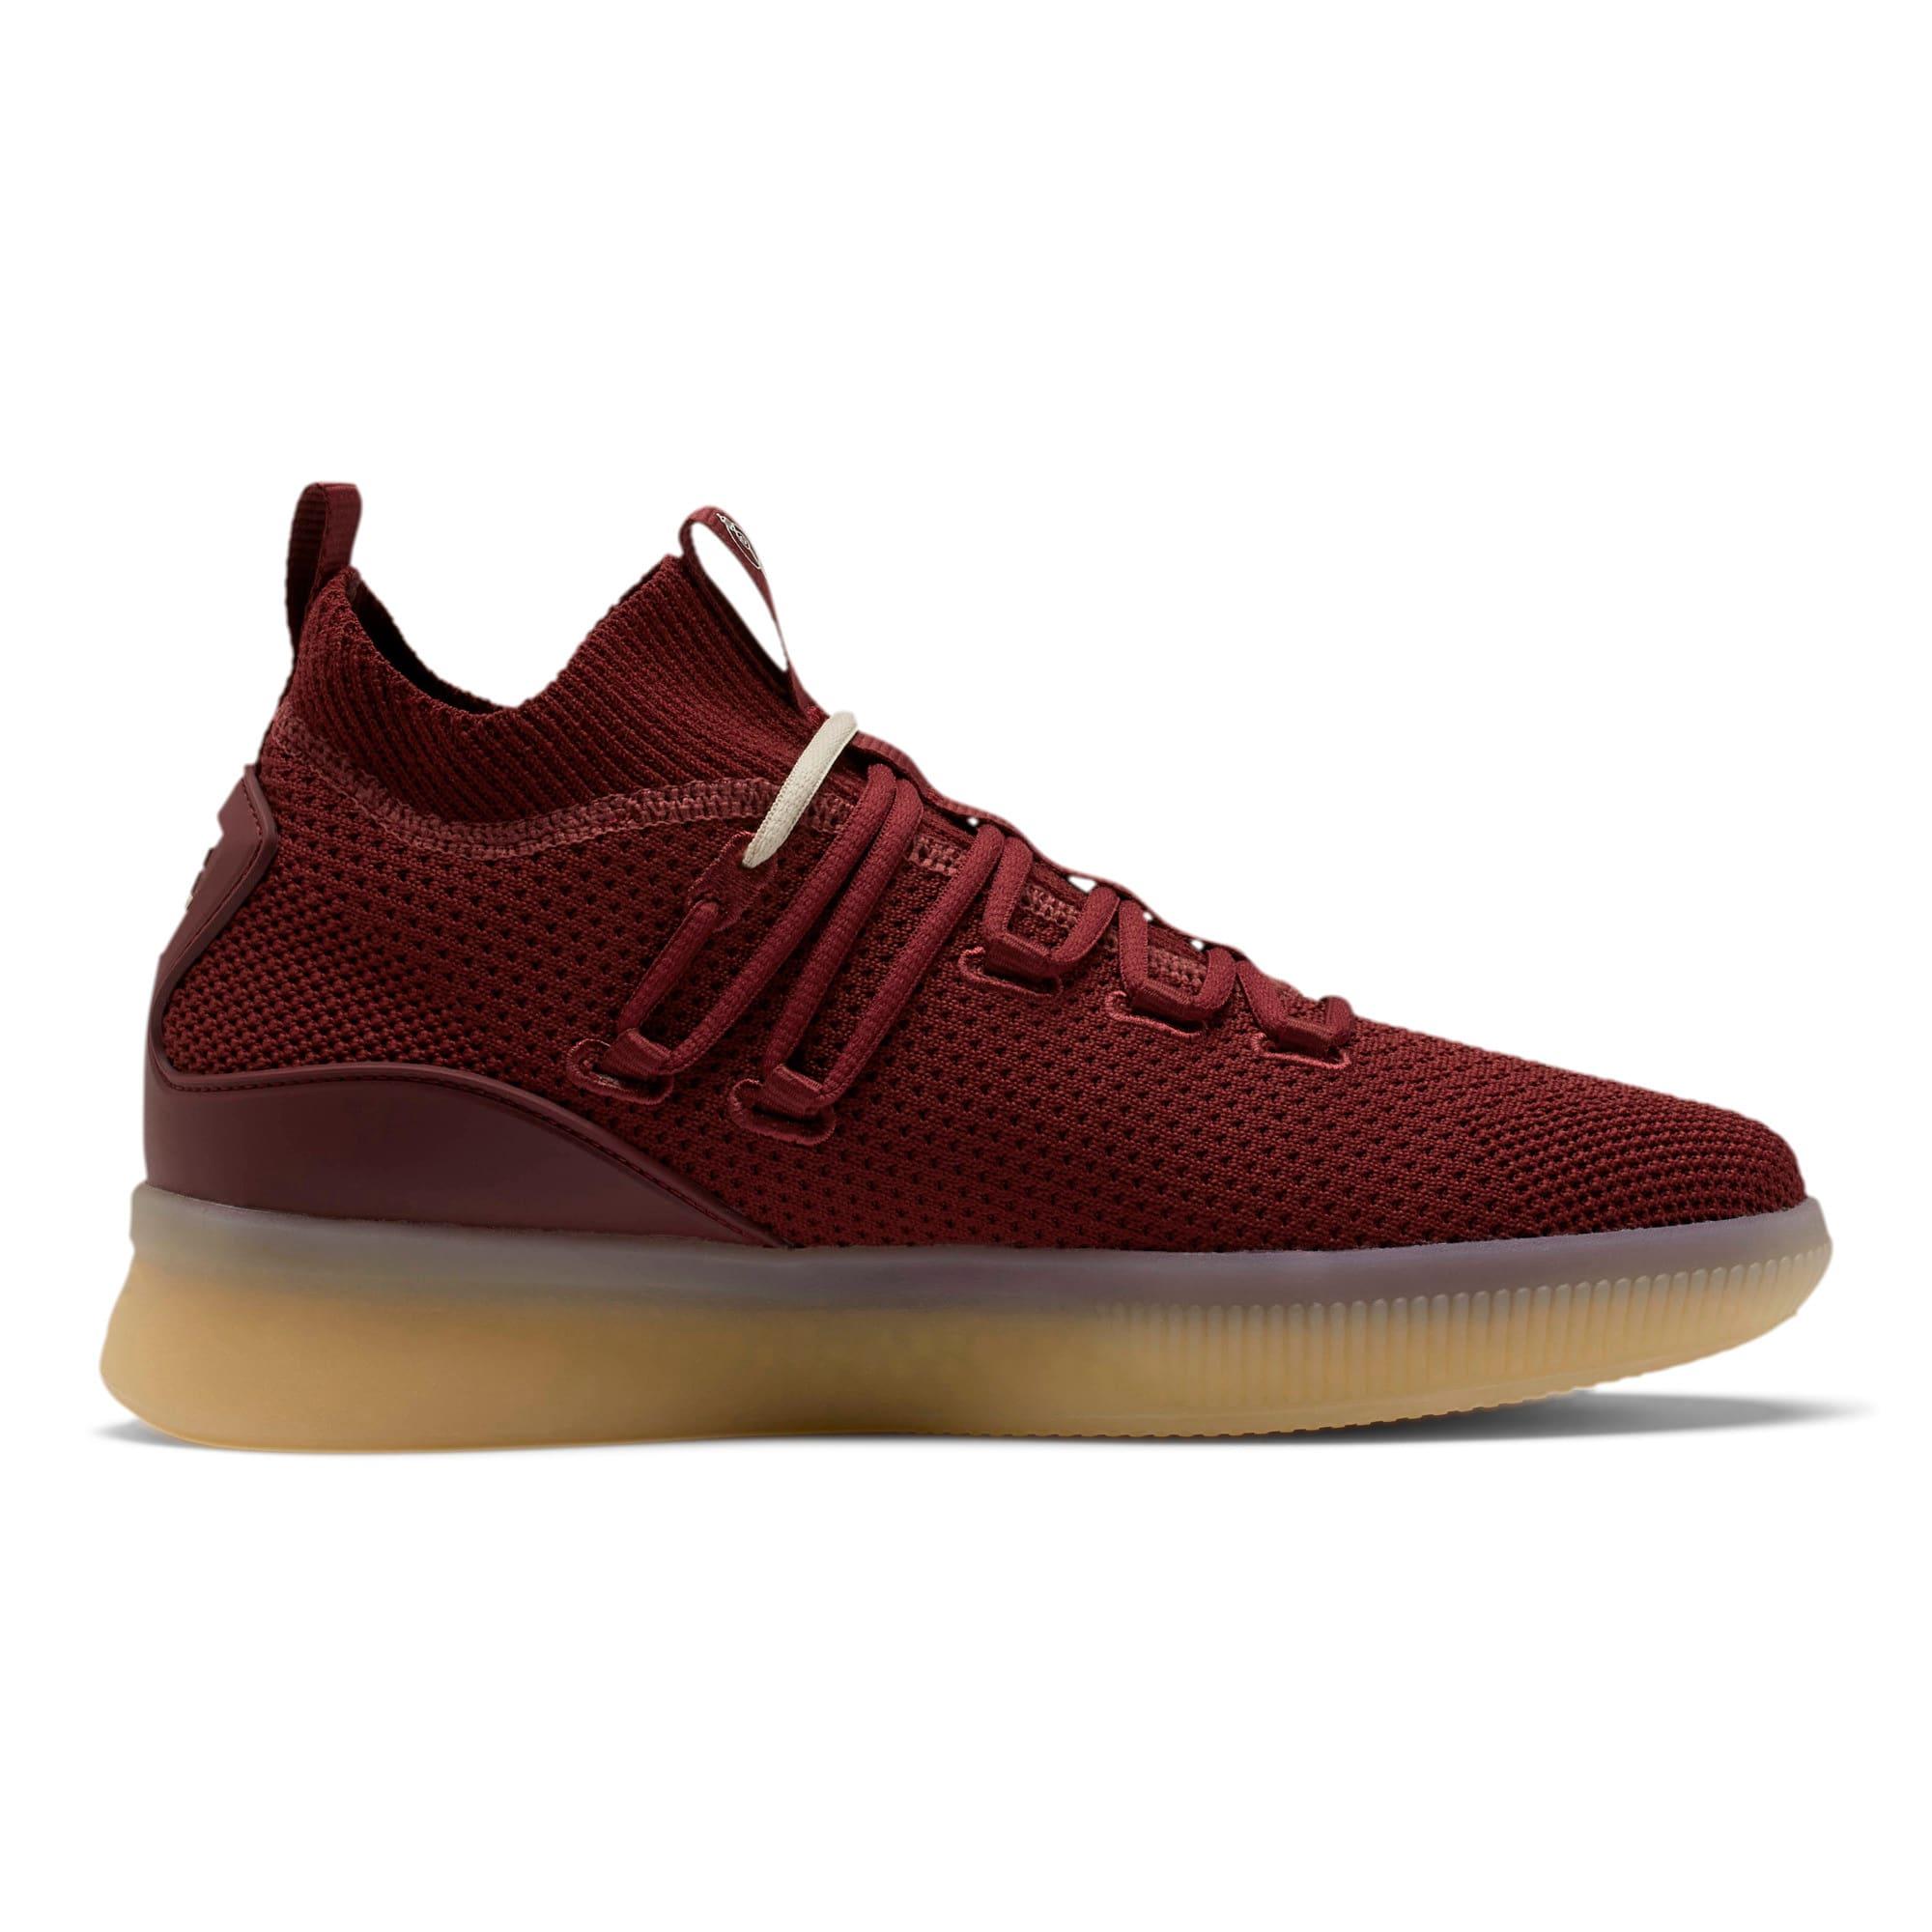 Thumbnail 5 of Clyde Court Def Jam Basketball Shoes, Cordovan, medium